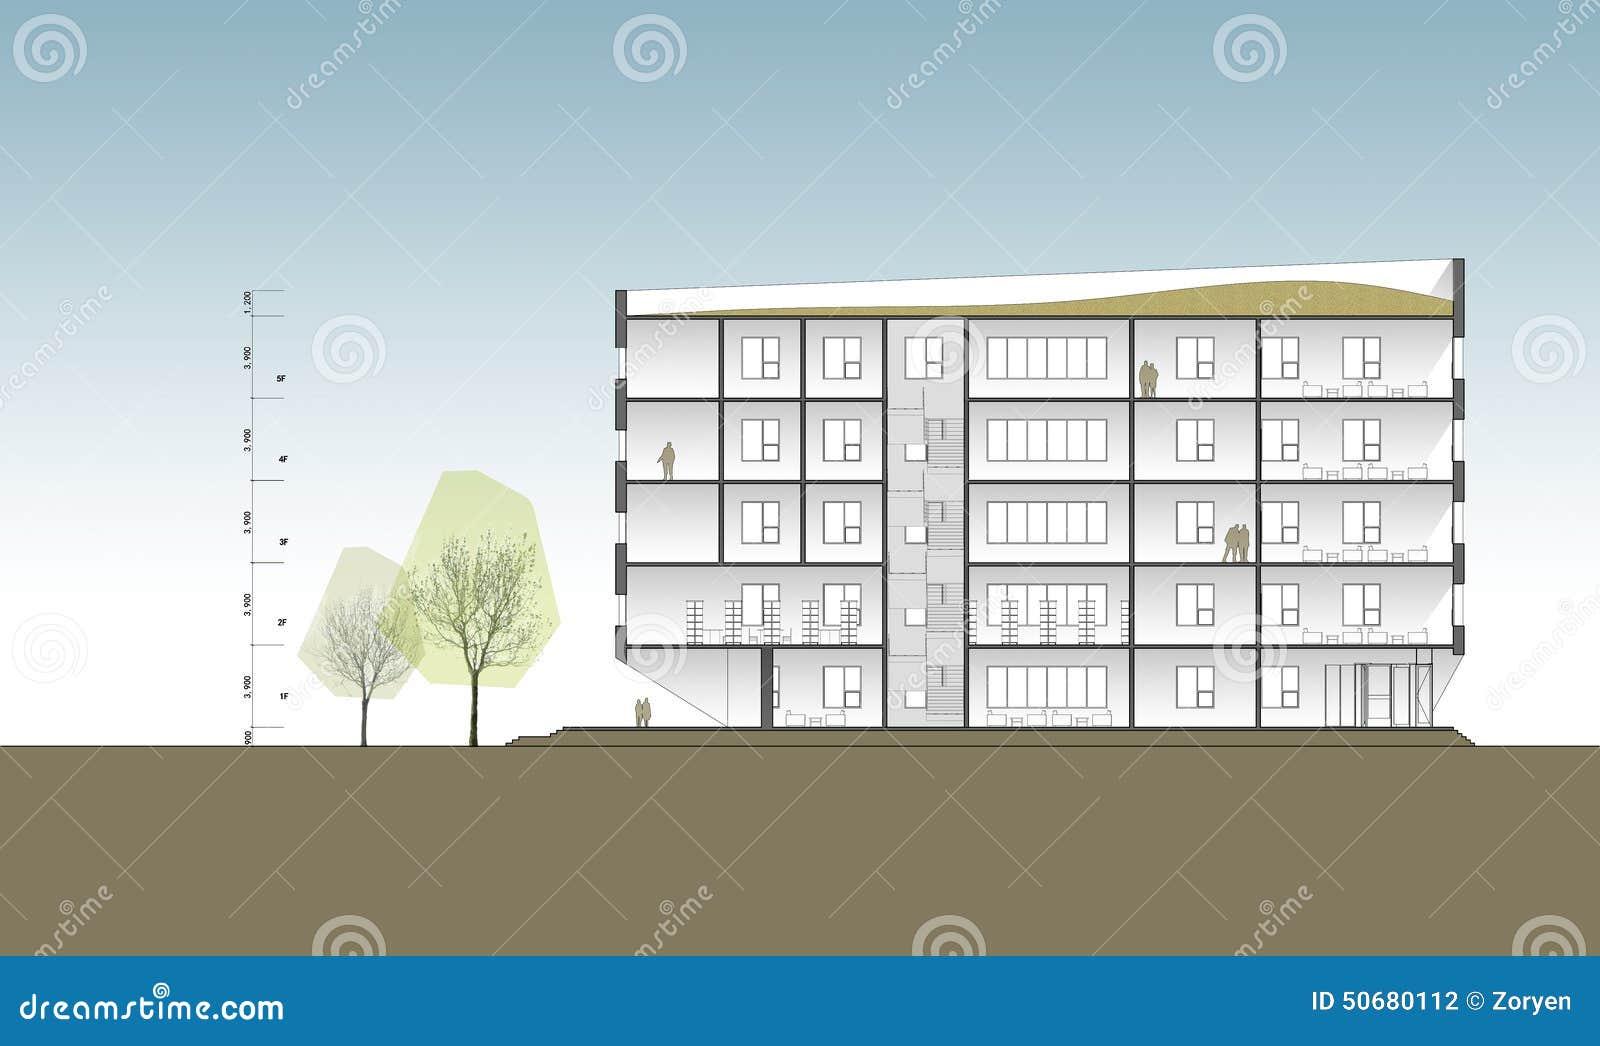 Download 修造的横断面 库存照片. 图片 包括有 公寓房, 图象, 任何地方, 例证, 的主动脉, 剪切, 布琼布拉 - 50680112